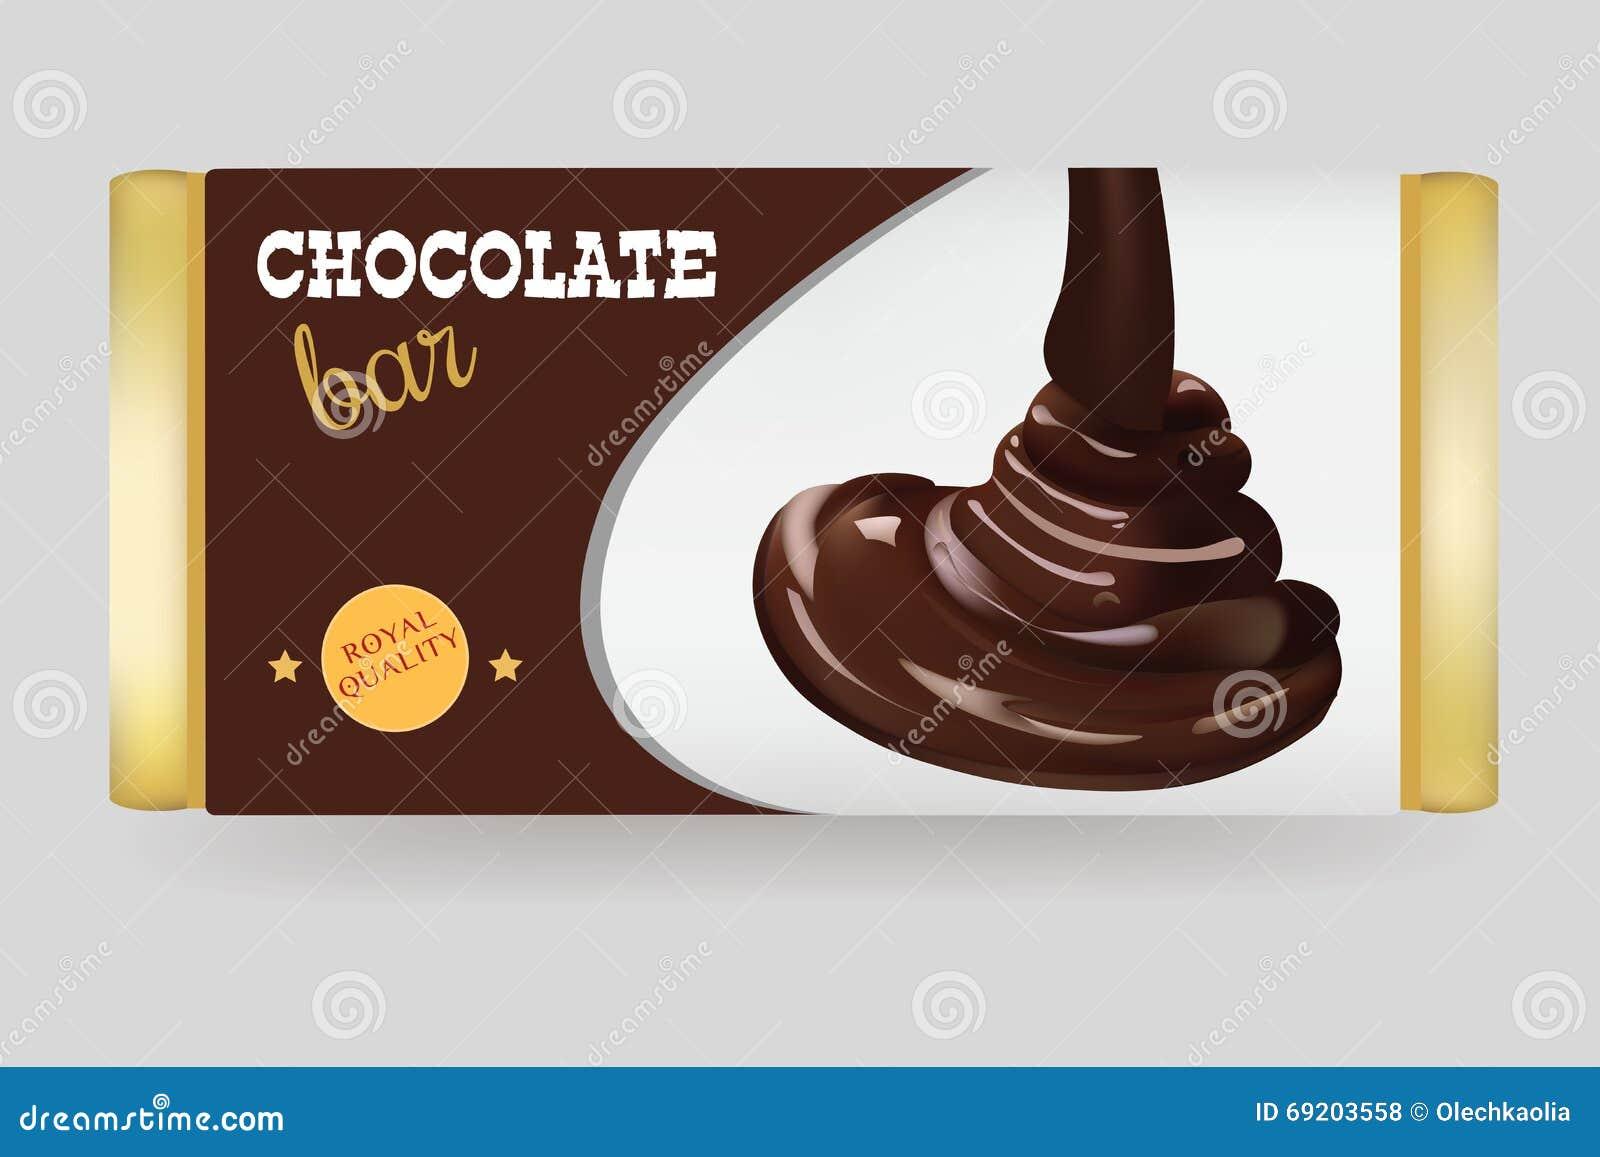 Design A Chocolate Box Ppt